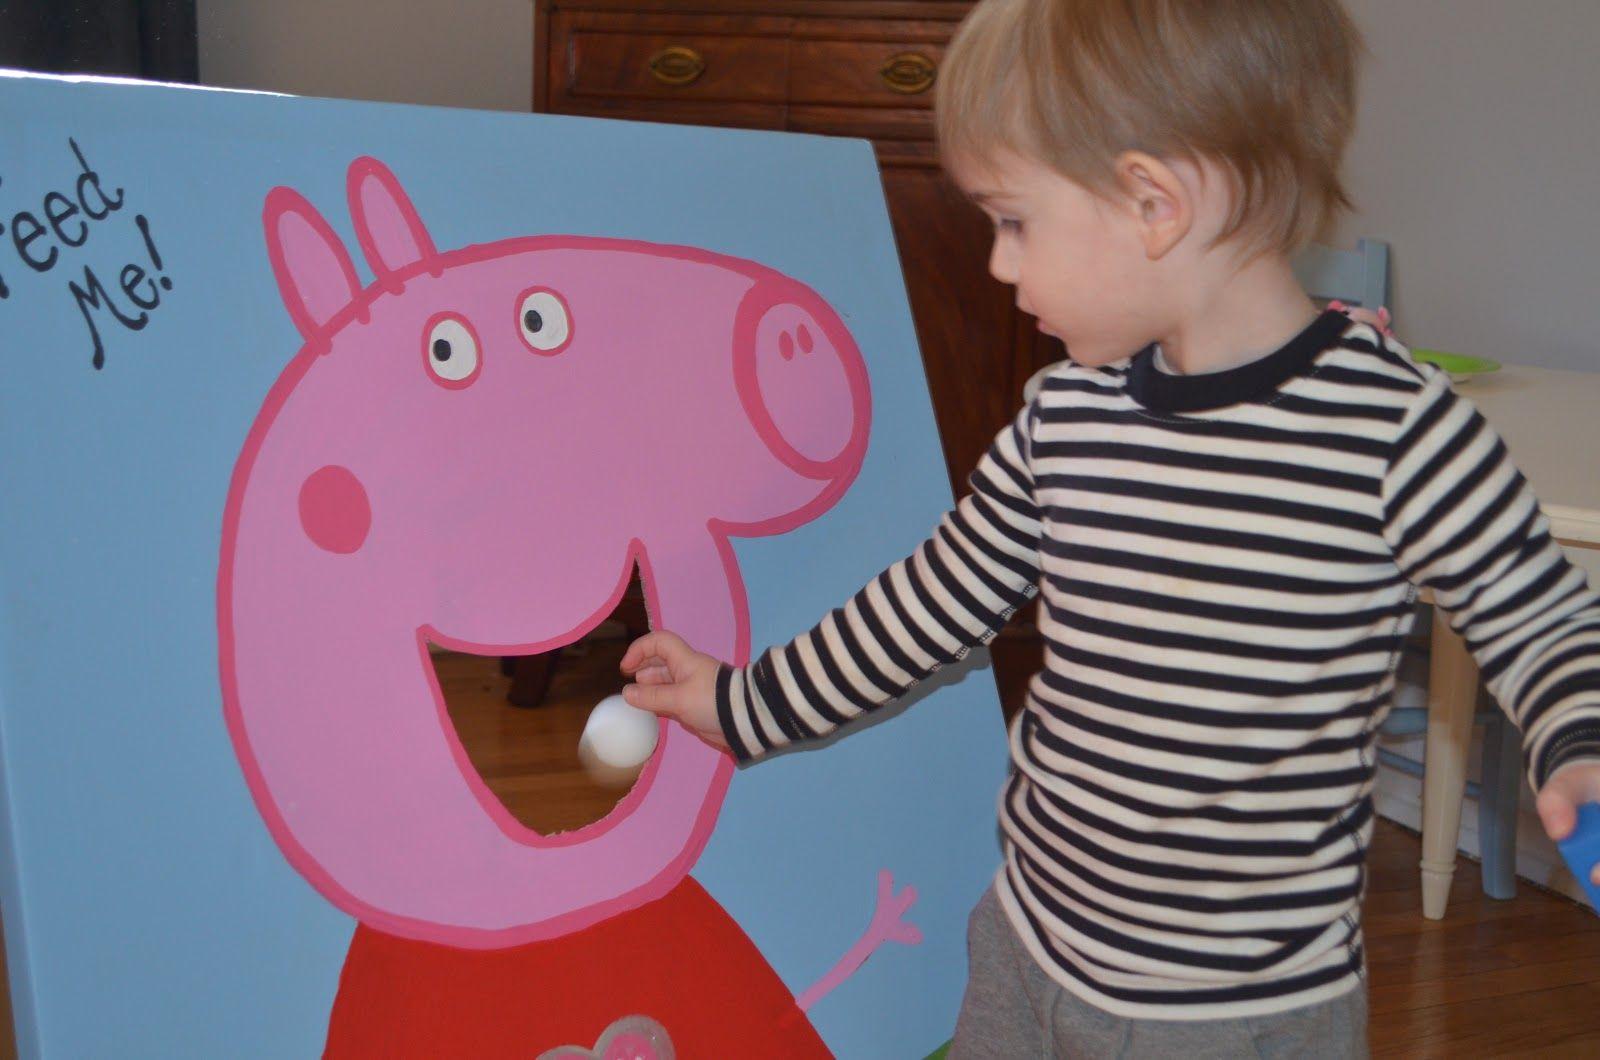 Three Friends Paint Peppa Pig Birthday Party Decorations Peppa Pig Birthday Party Peppa Pig Birthday